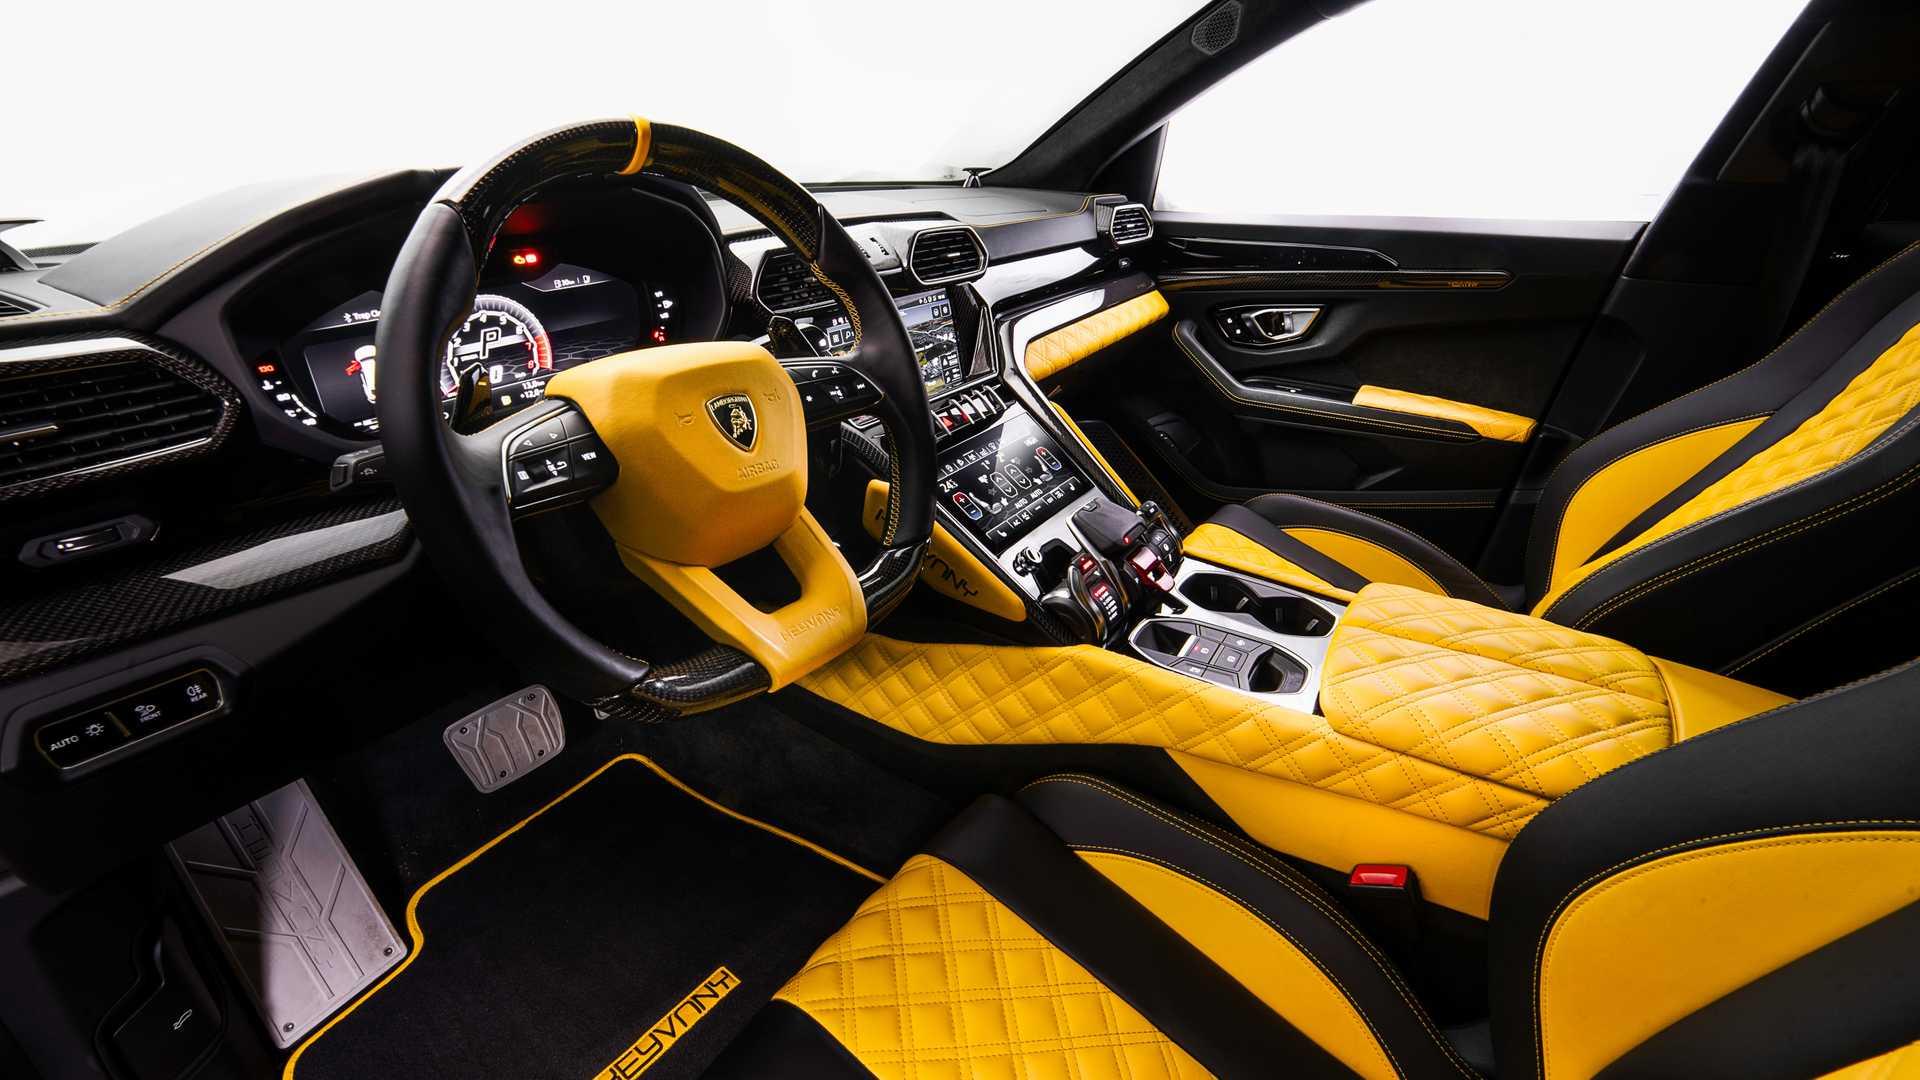 Двигатель кроссовера Lamborghini Urus разогнали до 820 л.с.